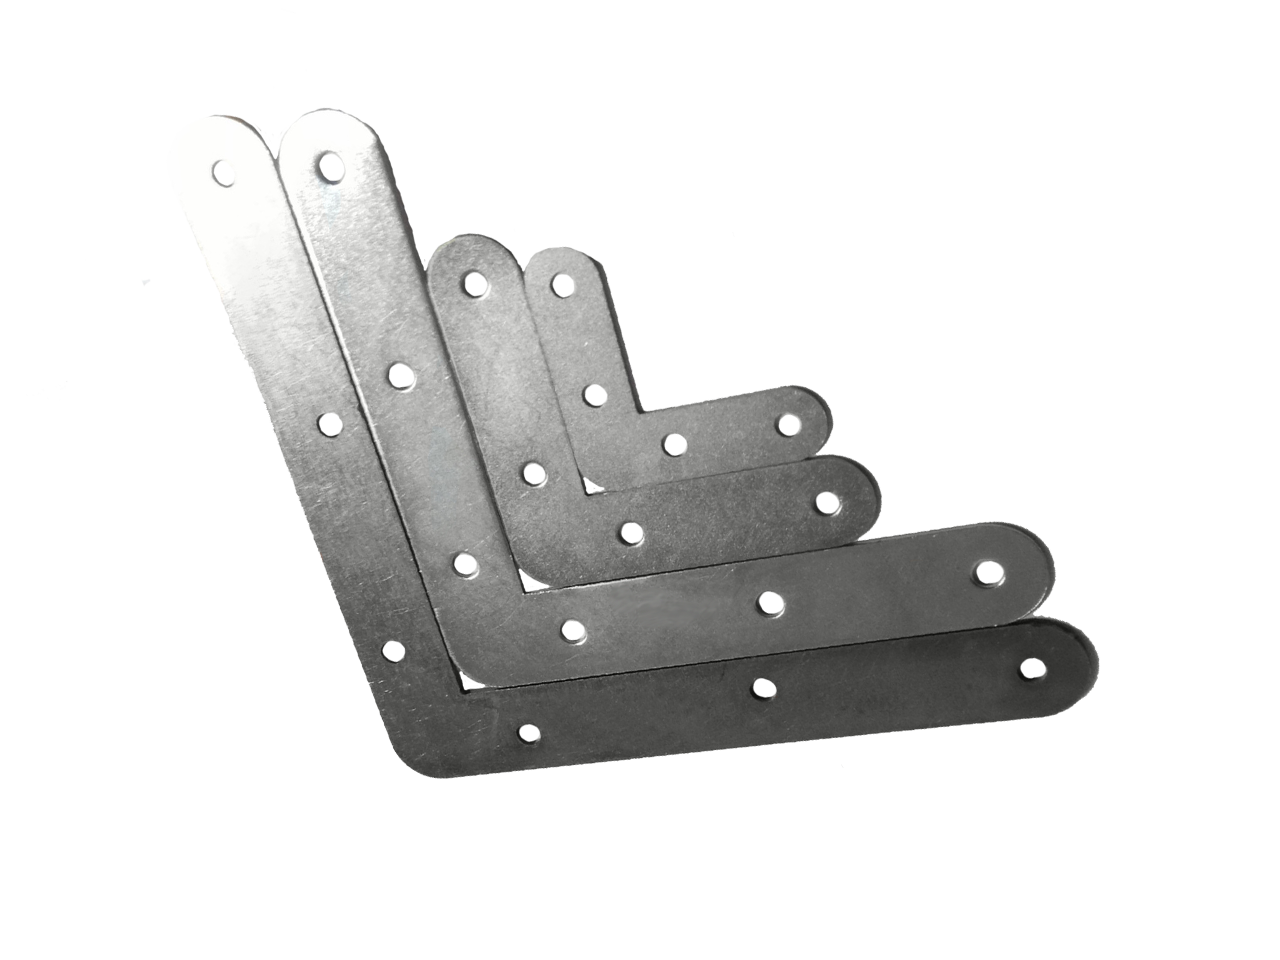 Angular connector